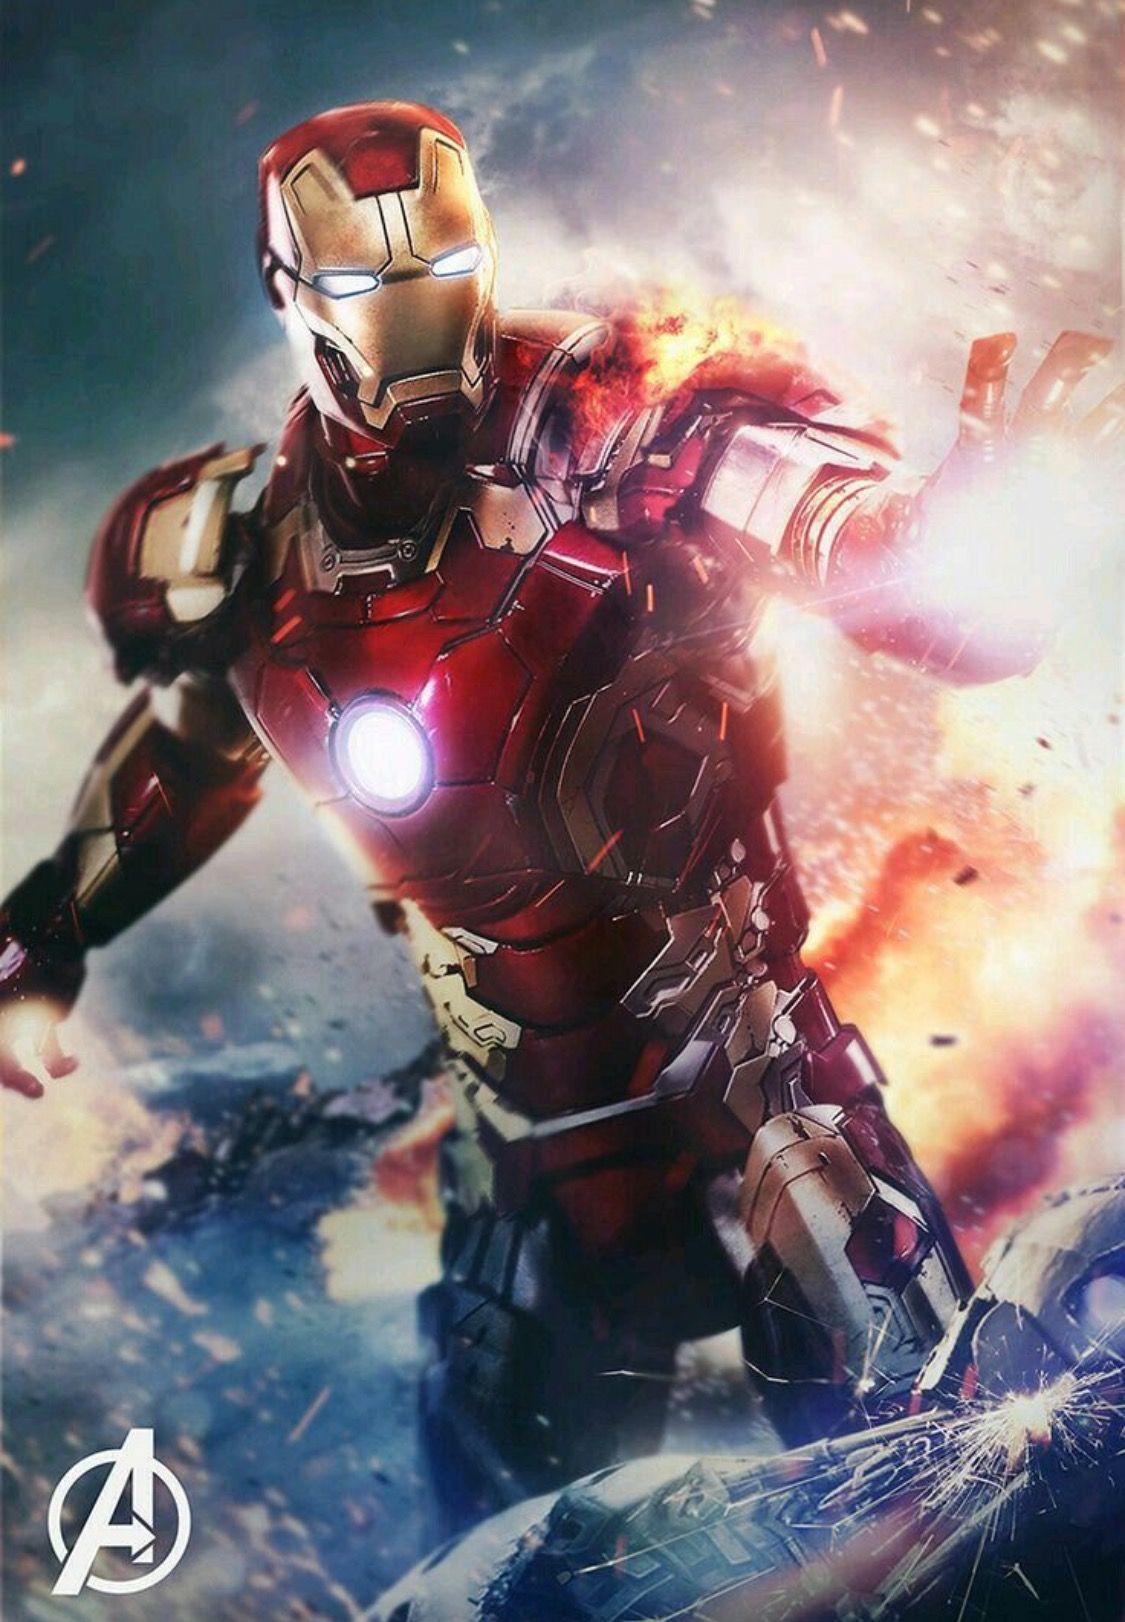 Iron man the full movie